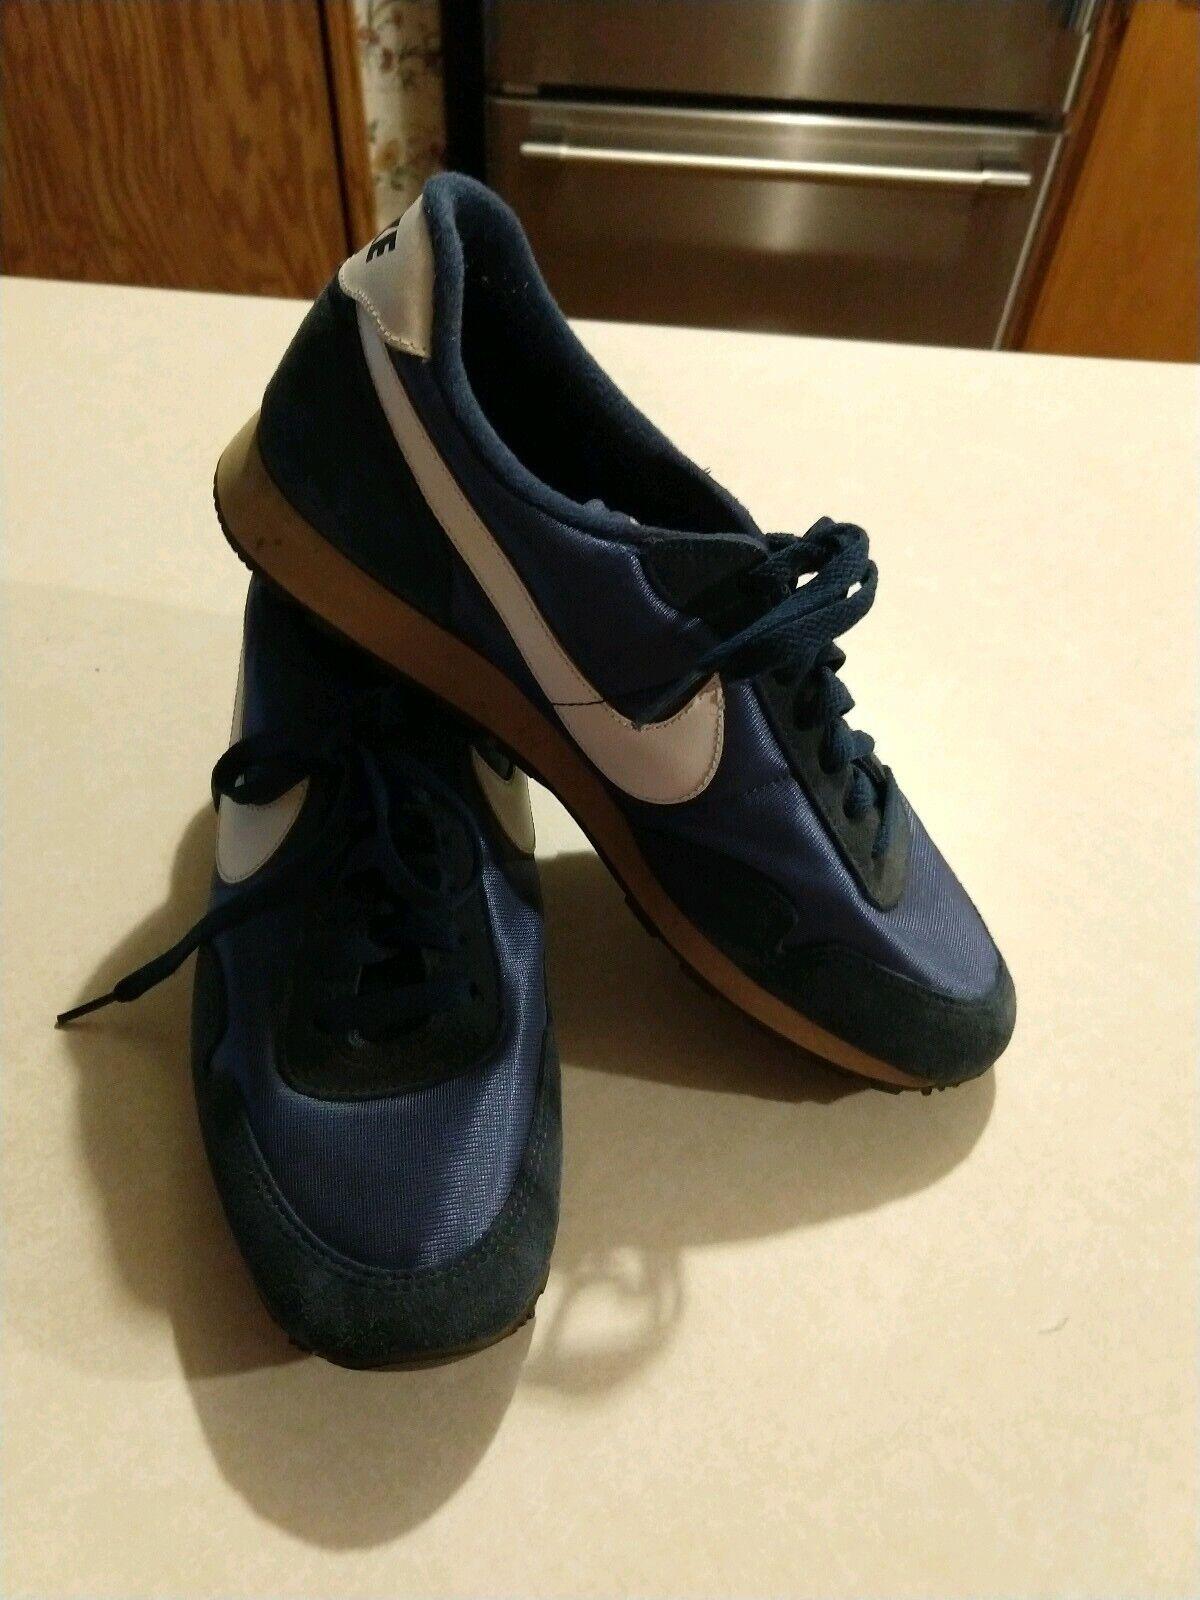 VINTAGE NIKE WOMENS SHOES SZ 9.5 Nike  shoes SZ 9 1 2 blueE NYLON SUEDED FABRIC